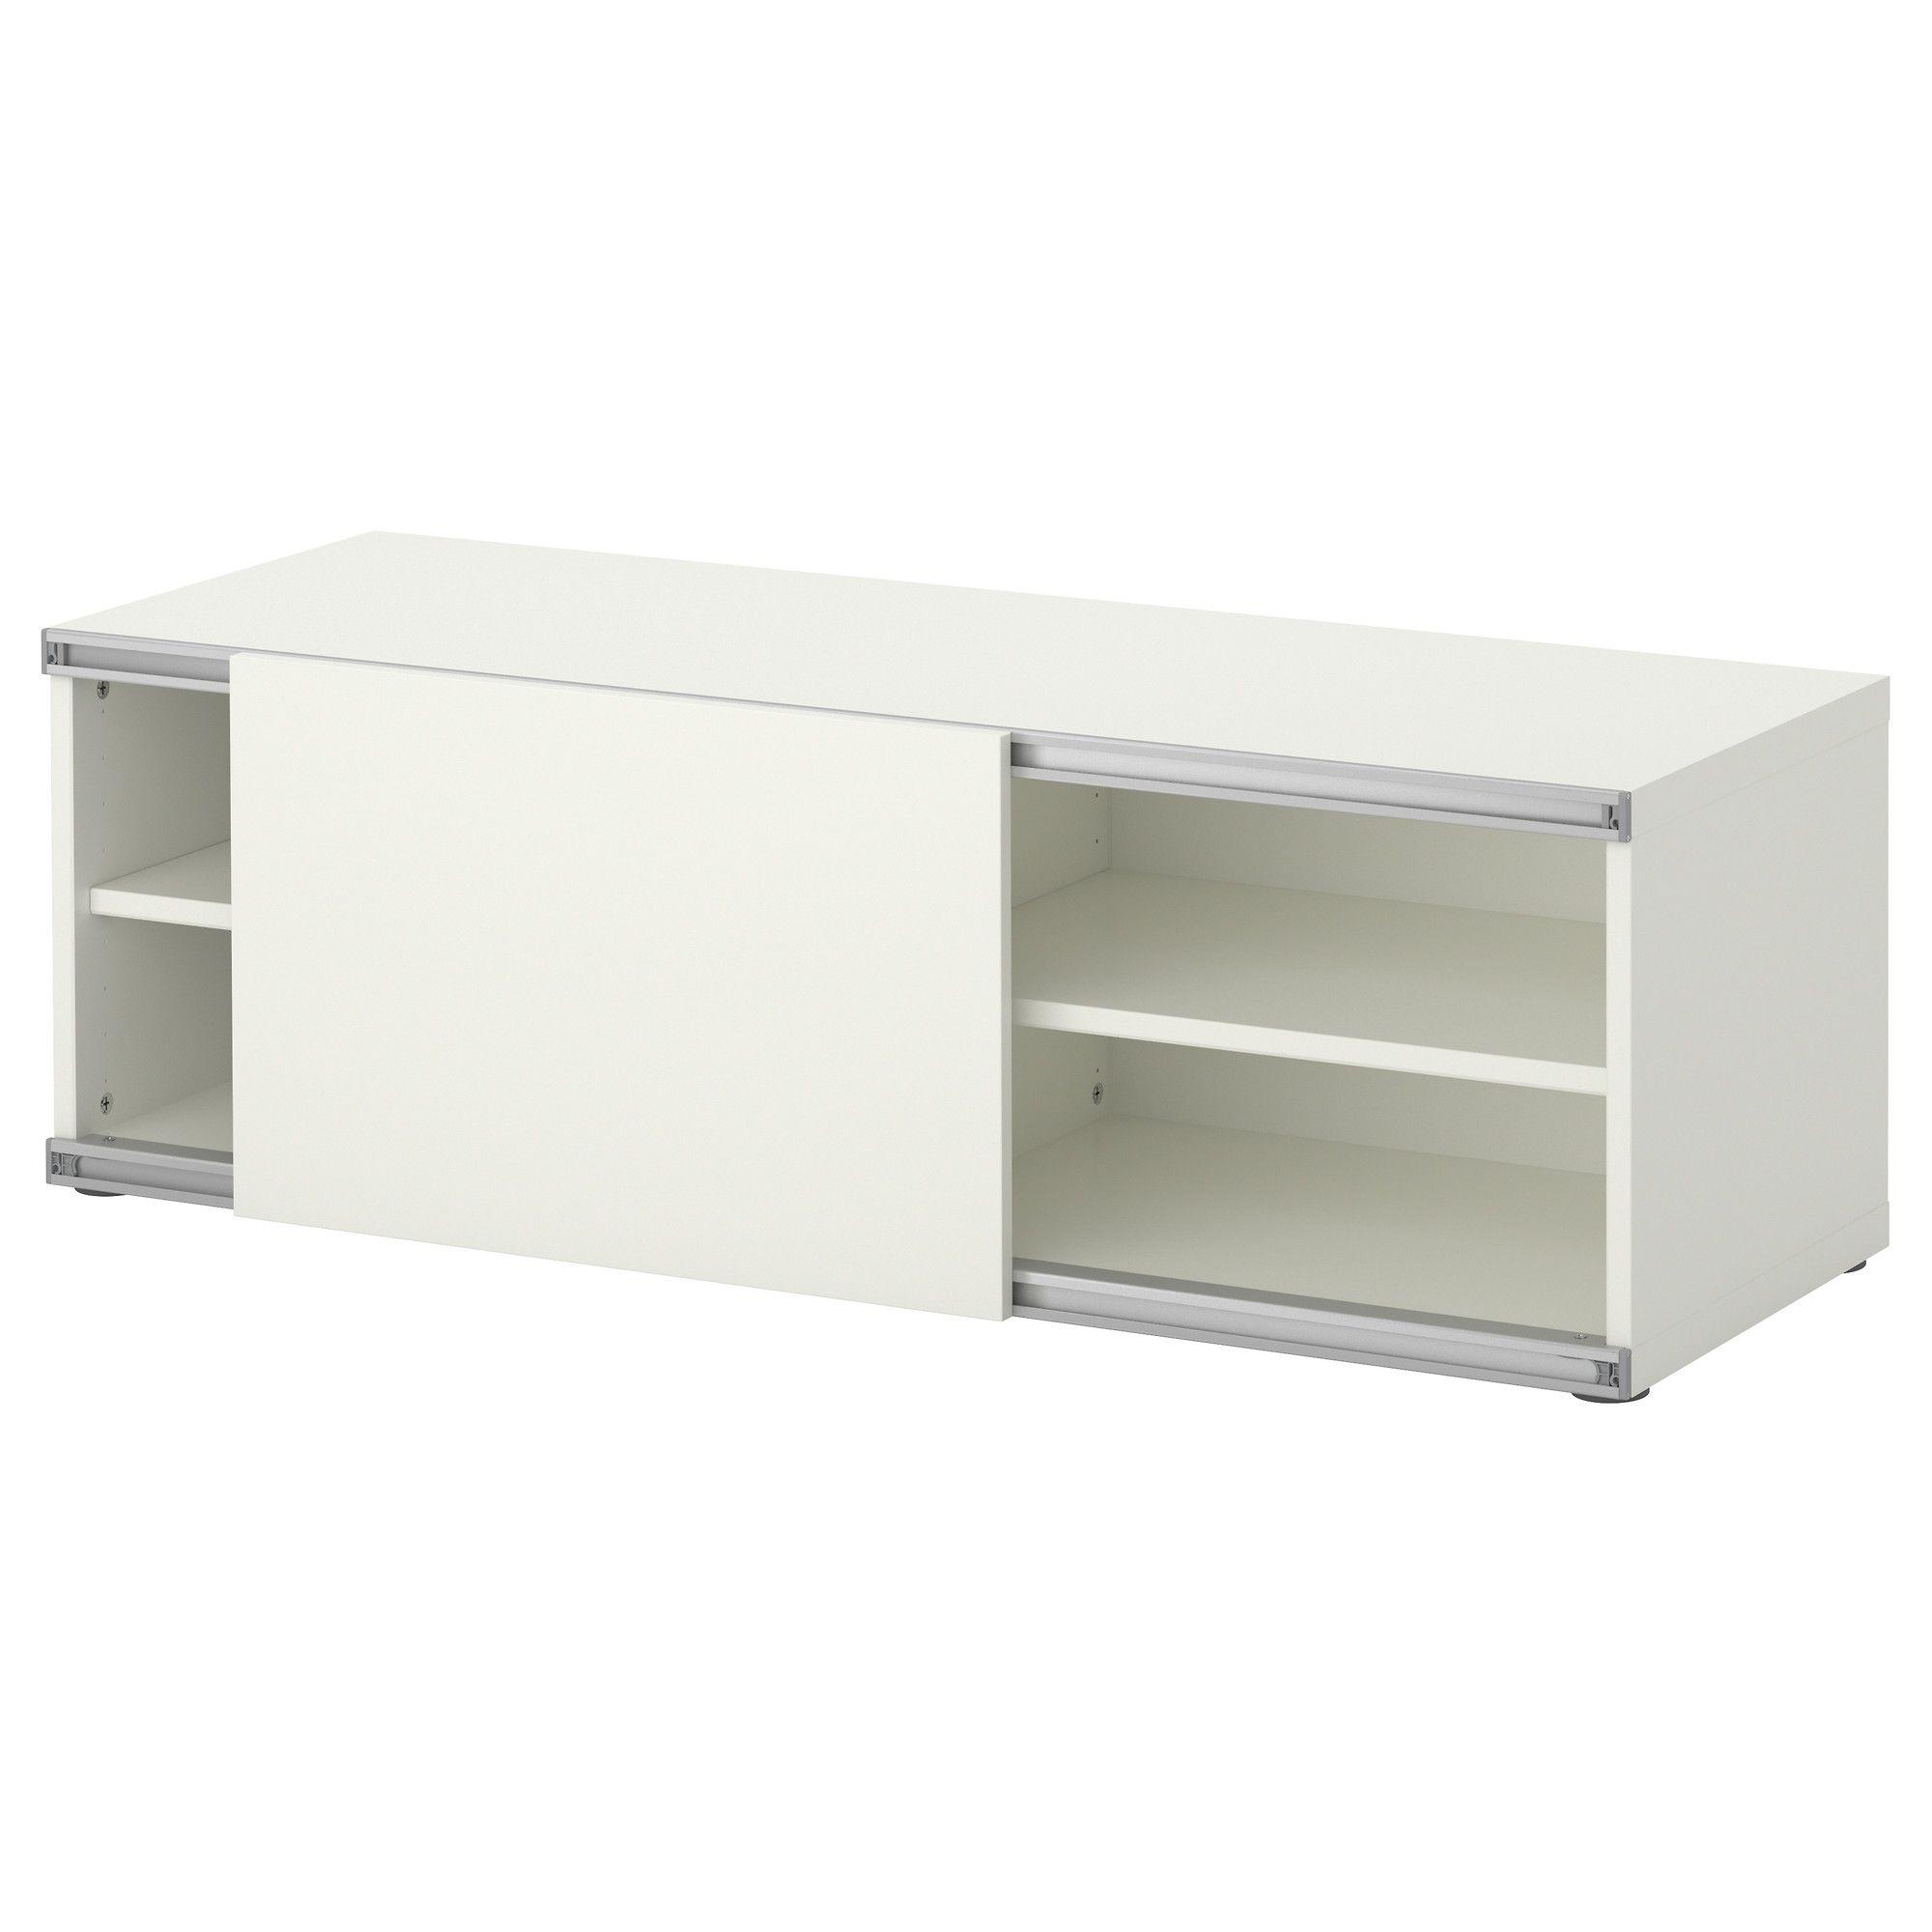 Best combi almacenaje puerta corredera ikea muebles 2 for Muebles almacenaje ikea